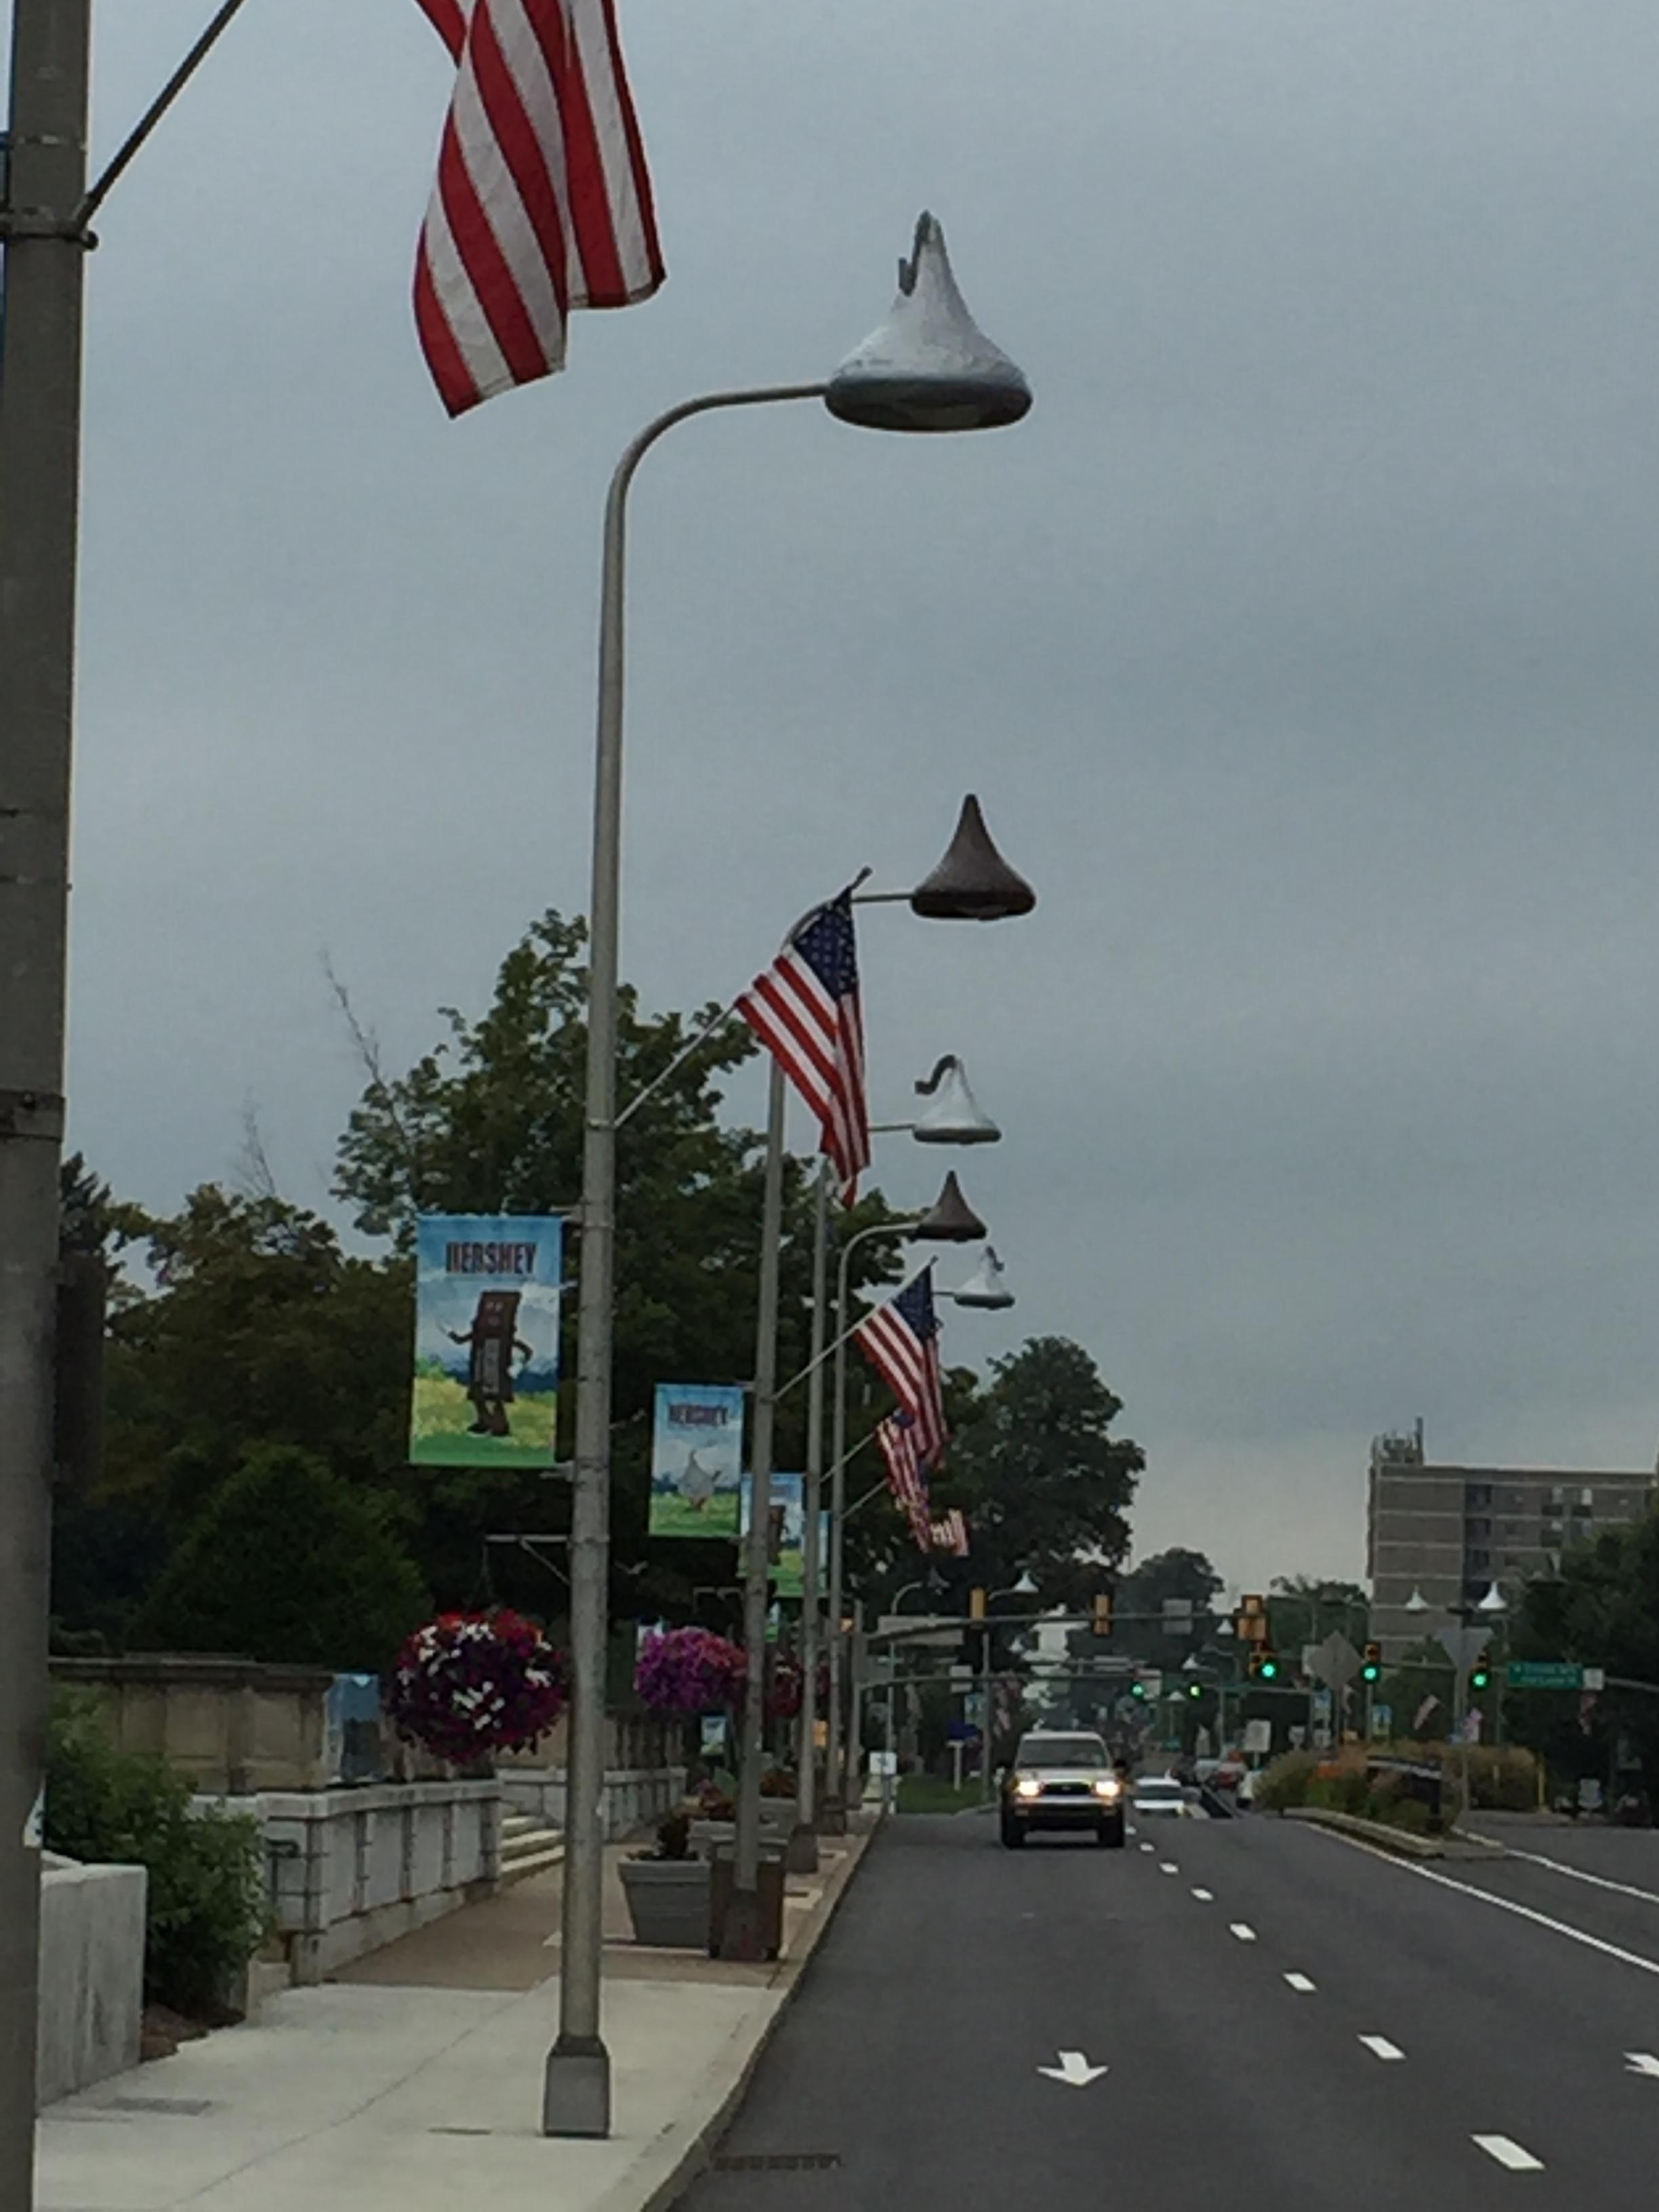 Chocolate Avenue, Hershey, Pa.